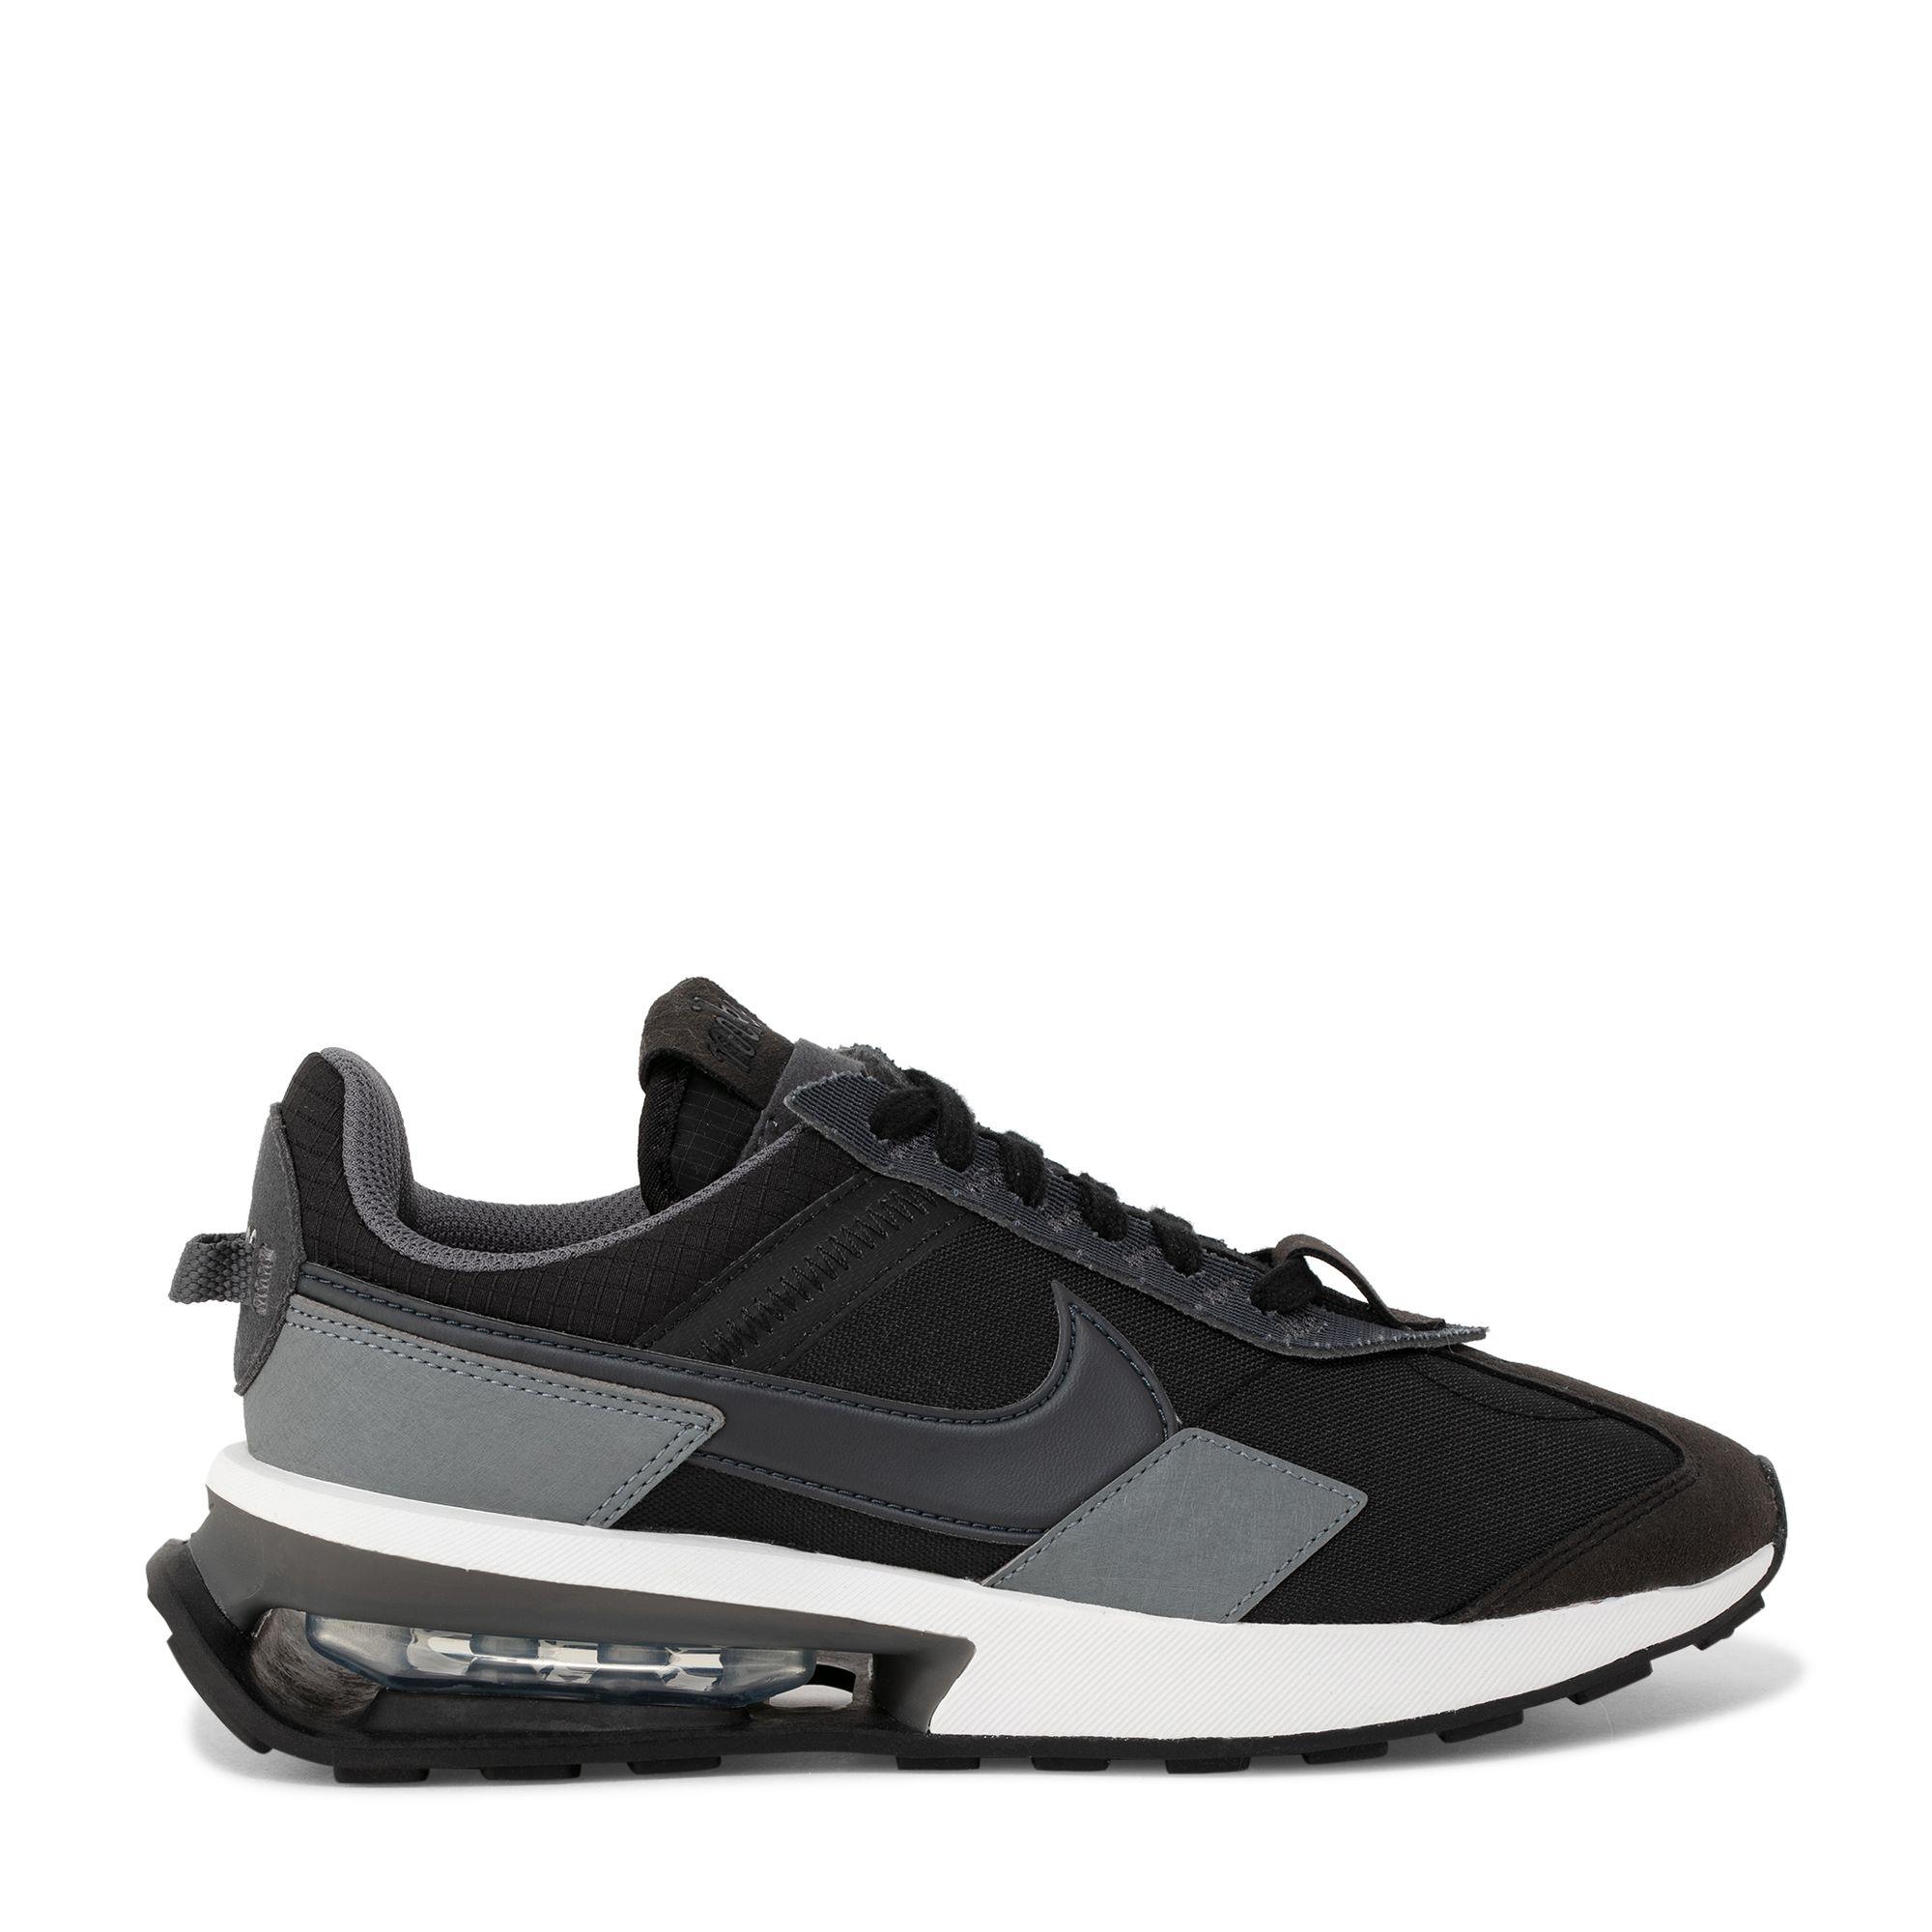 "Air Max Pre-Day ""Black"" sneakers"